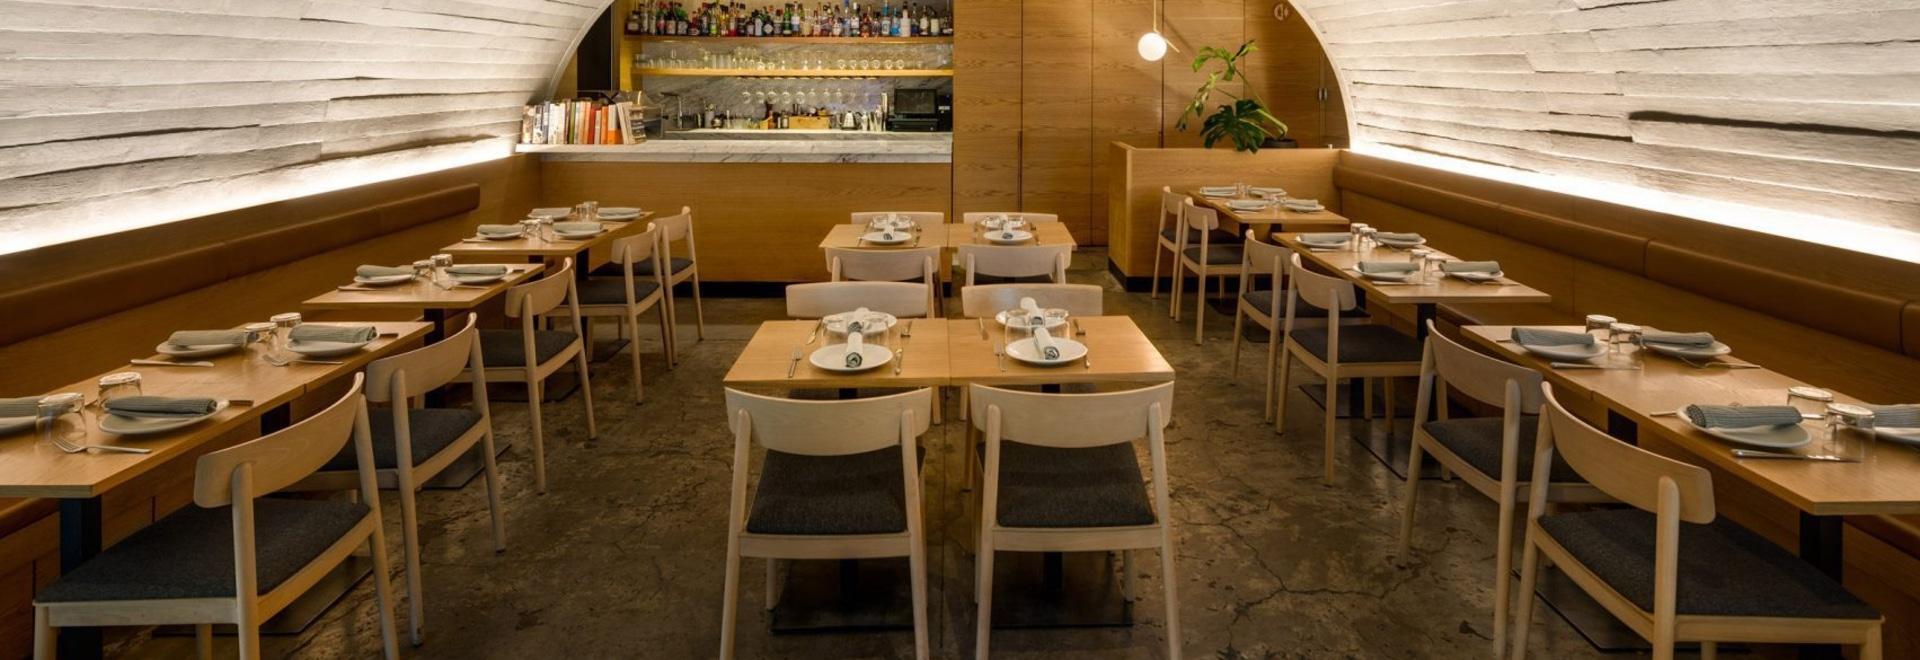 Concrete arch covers Mexico City's Italian restaurant Sartoria